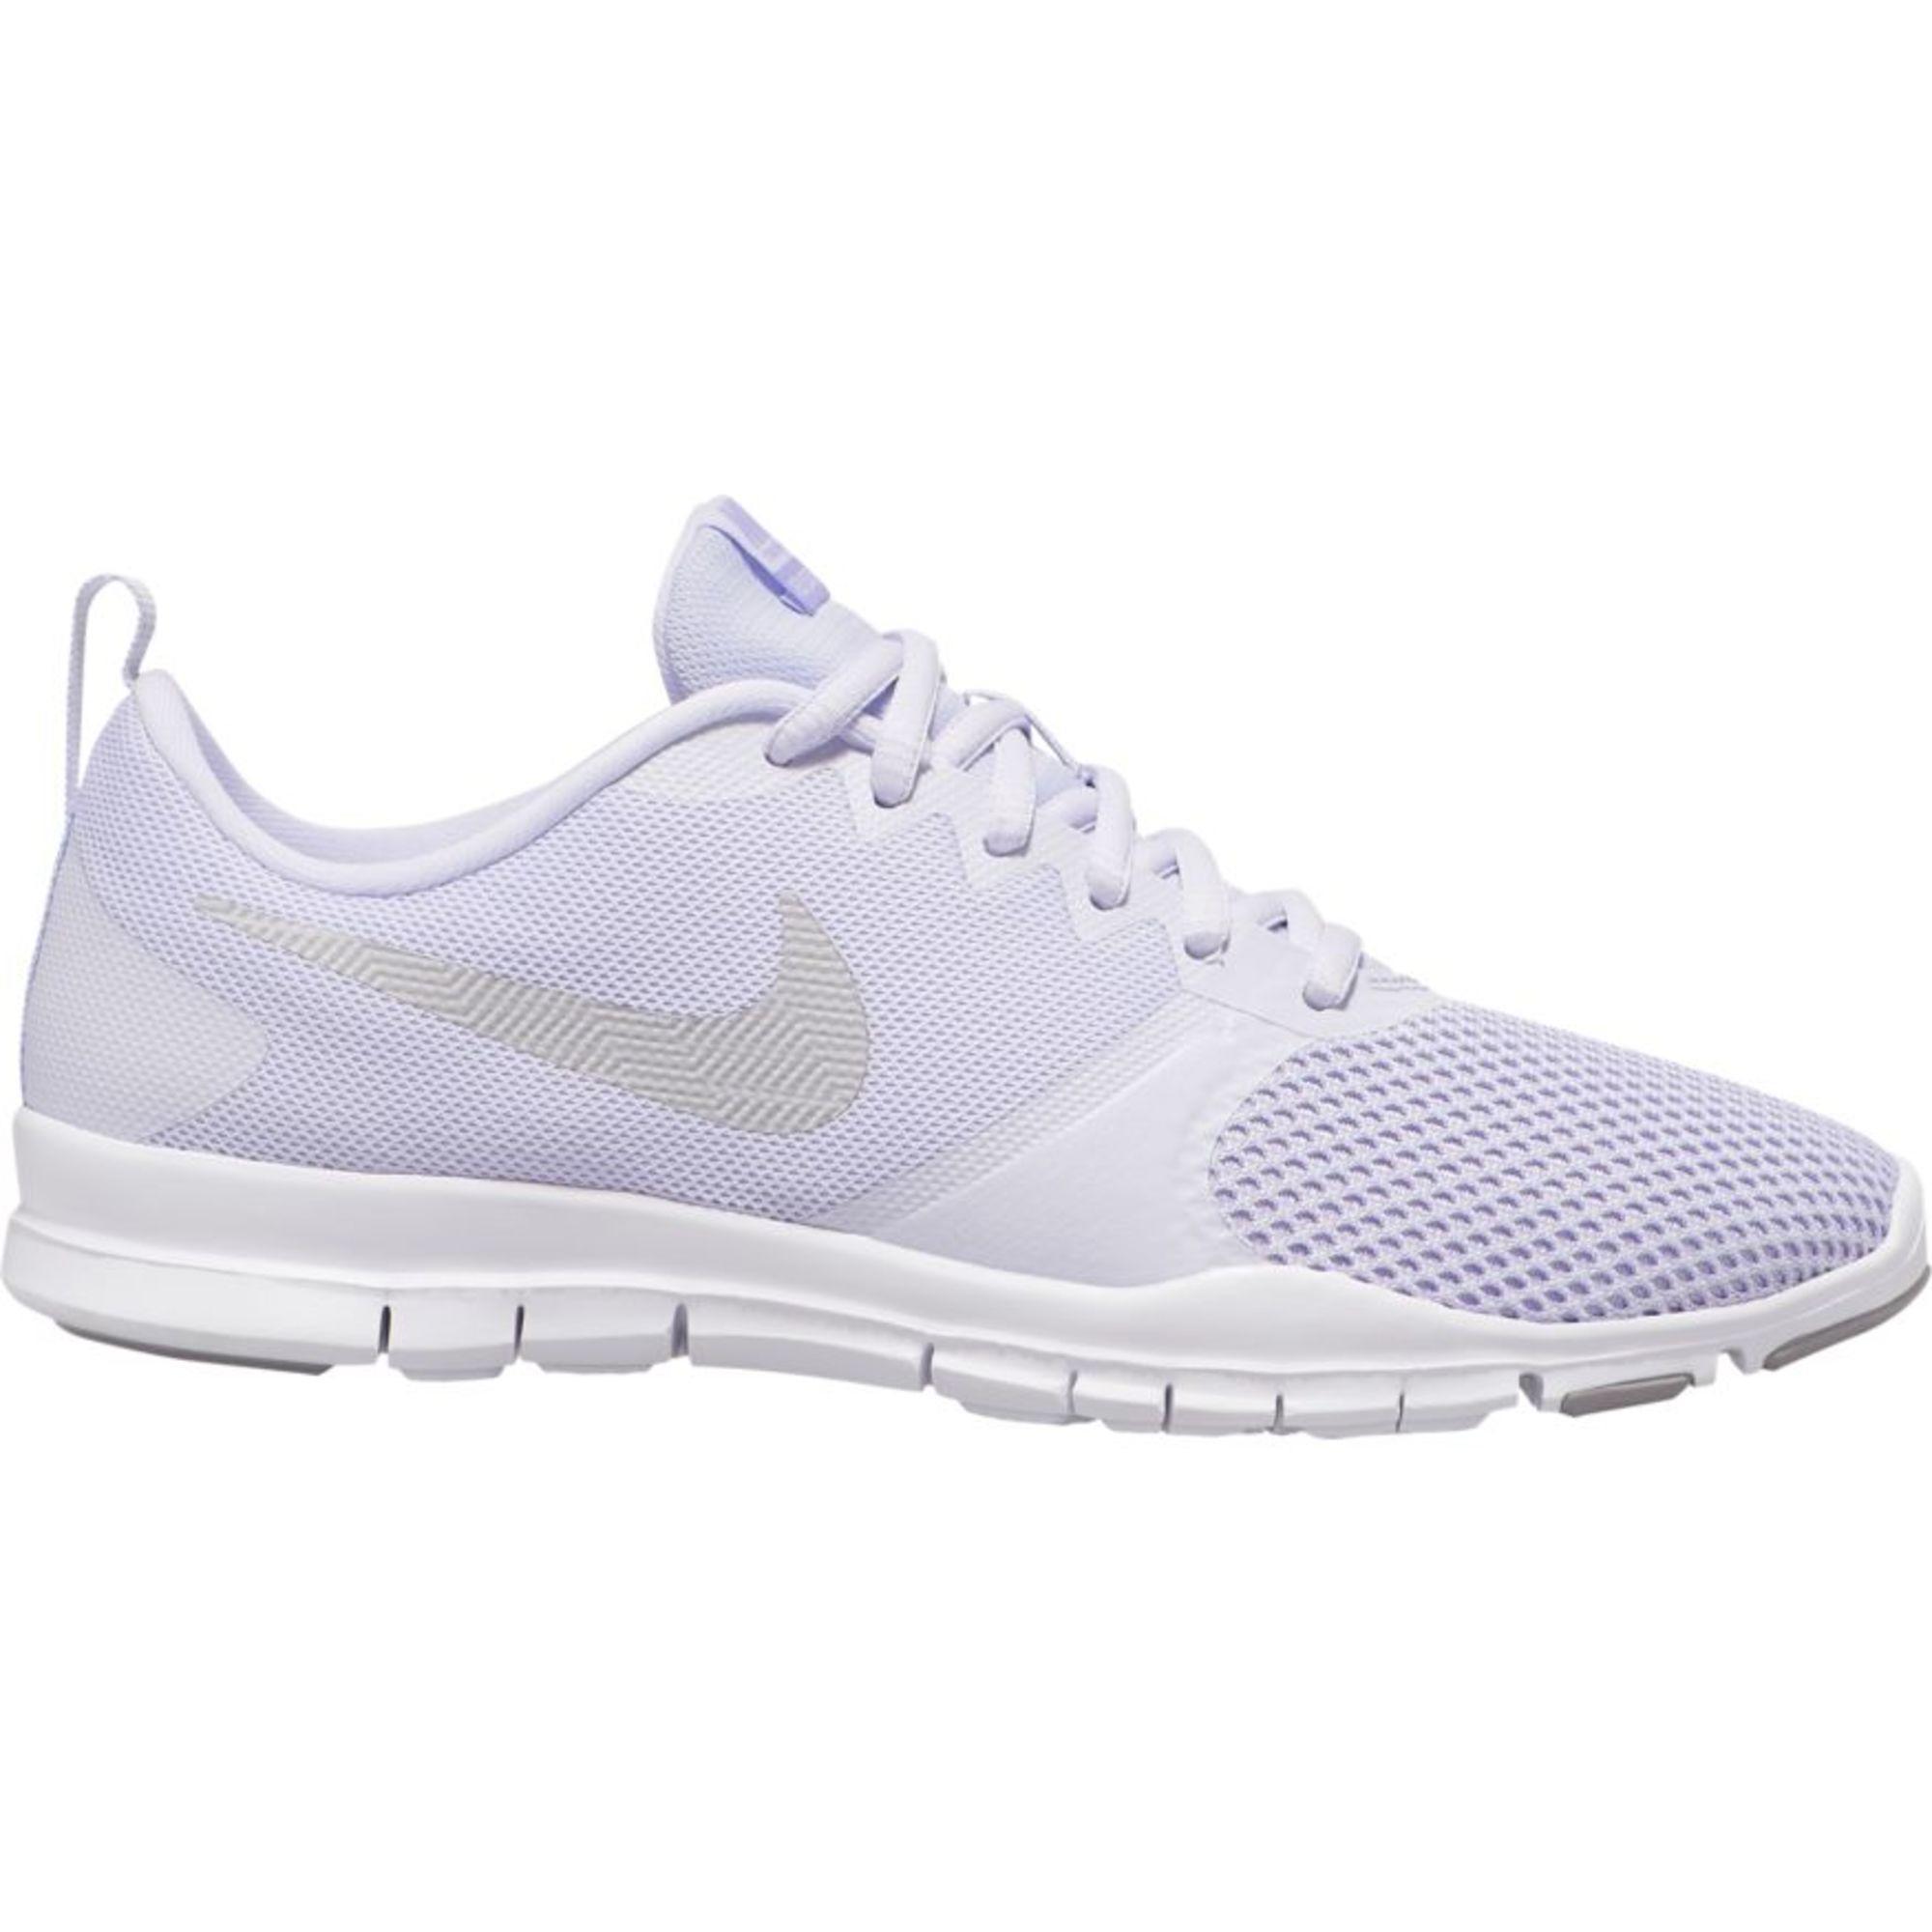 Fitnessschuhe Flex Essential | Schuhe > Sportschuhe > Fitnessschuhe | Nike